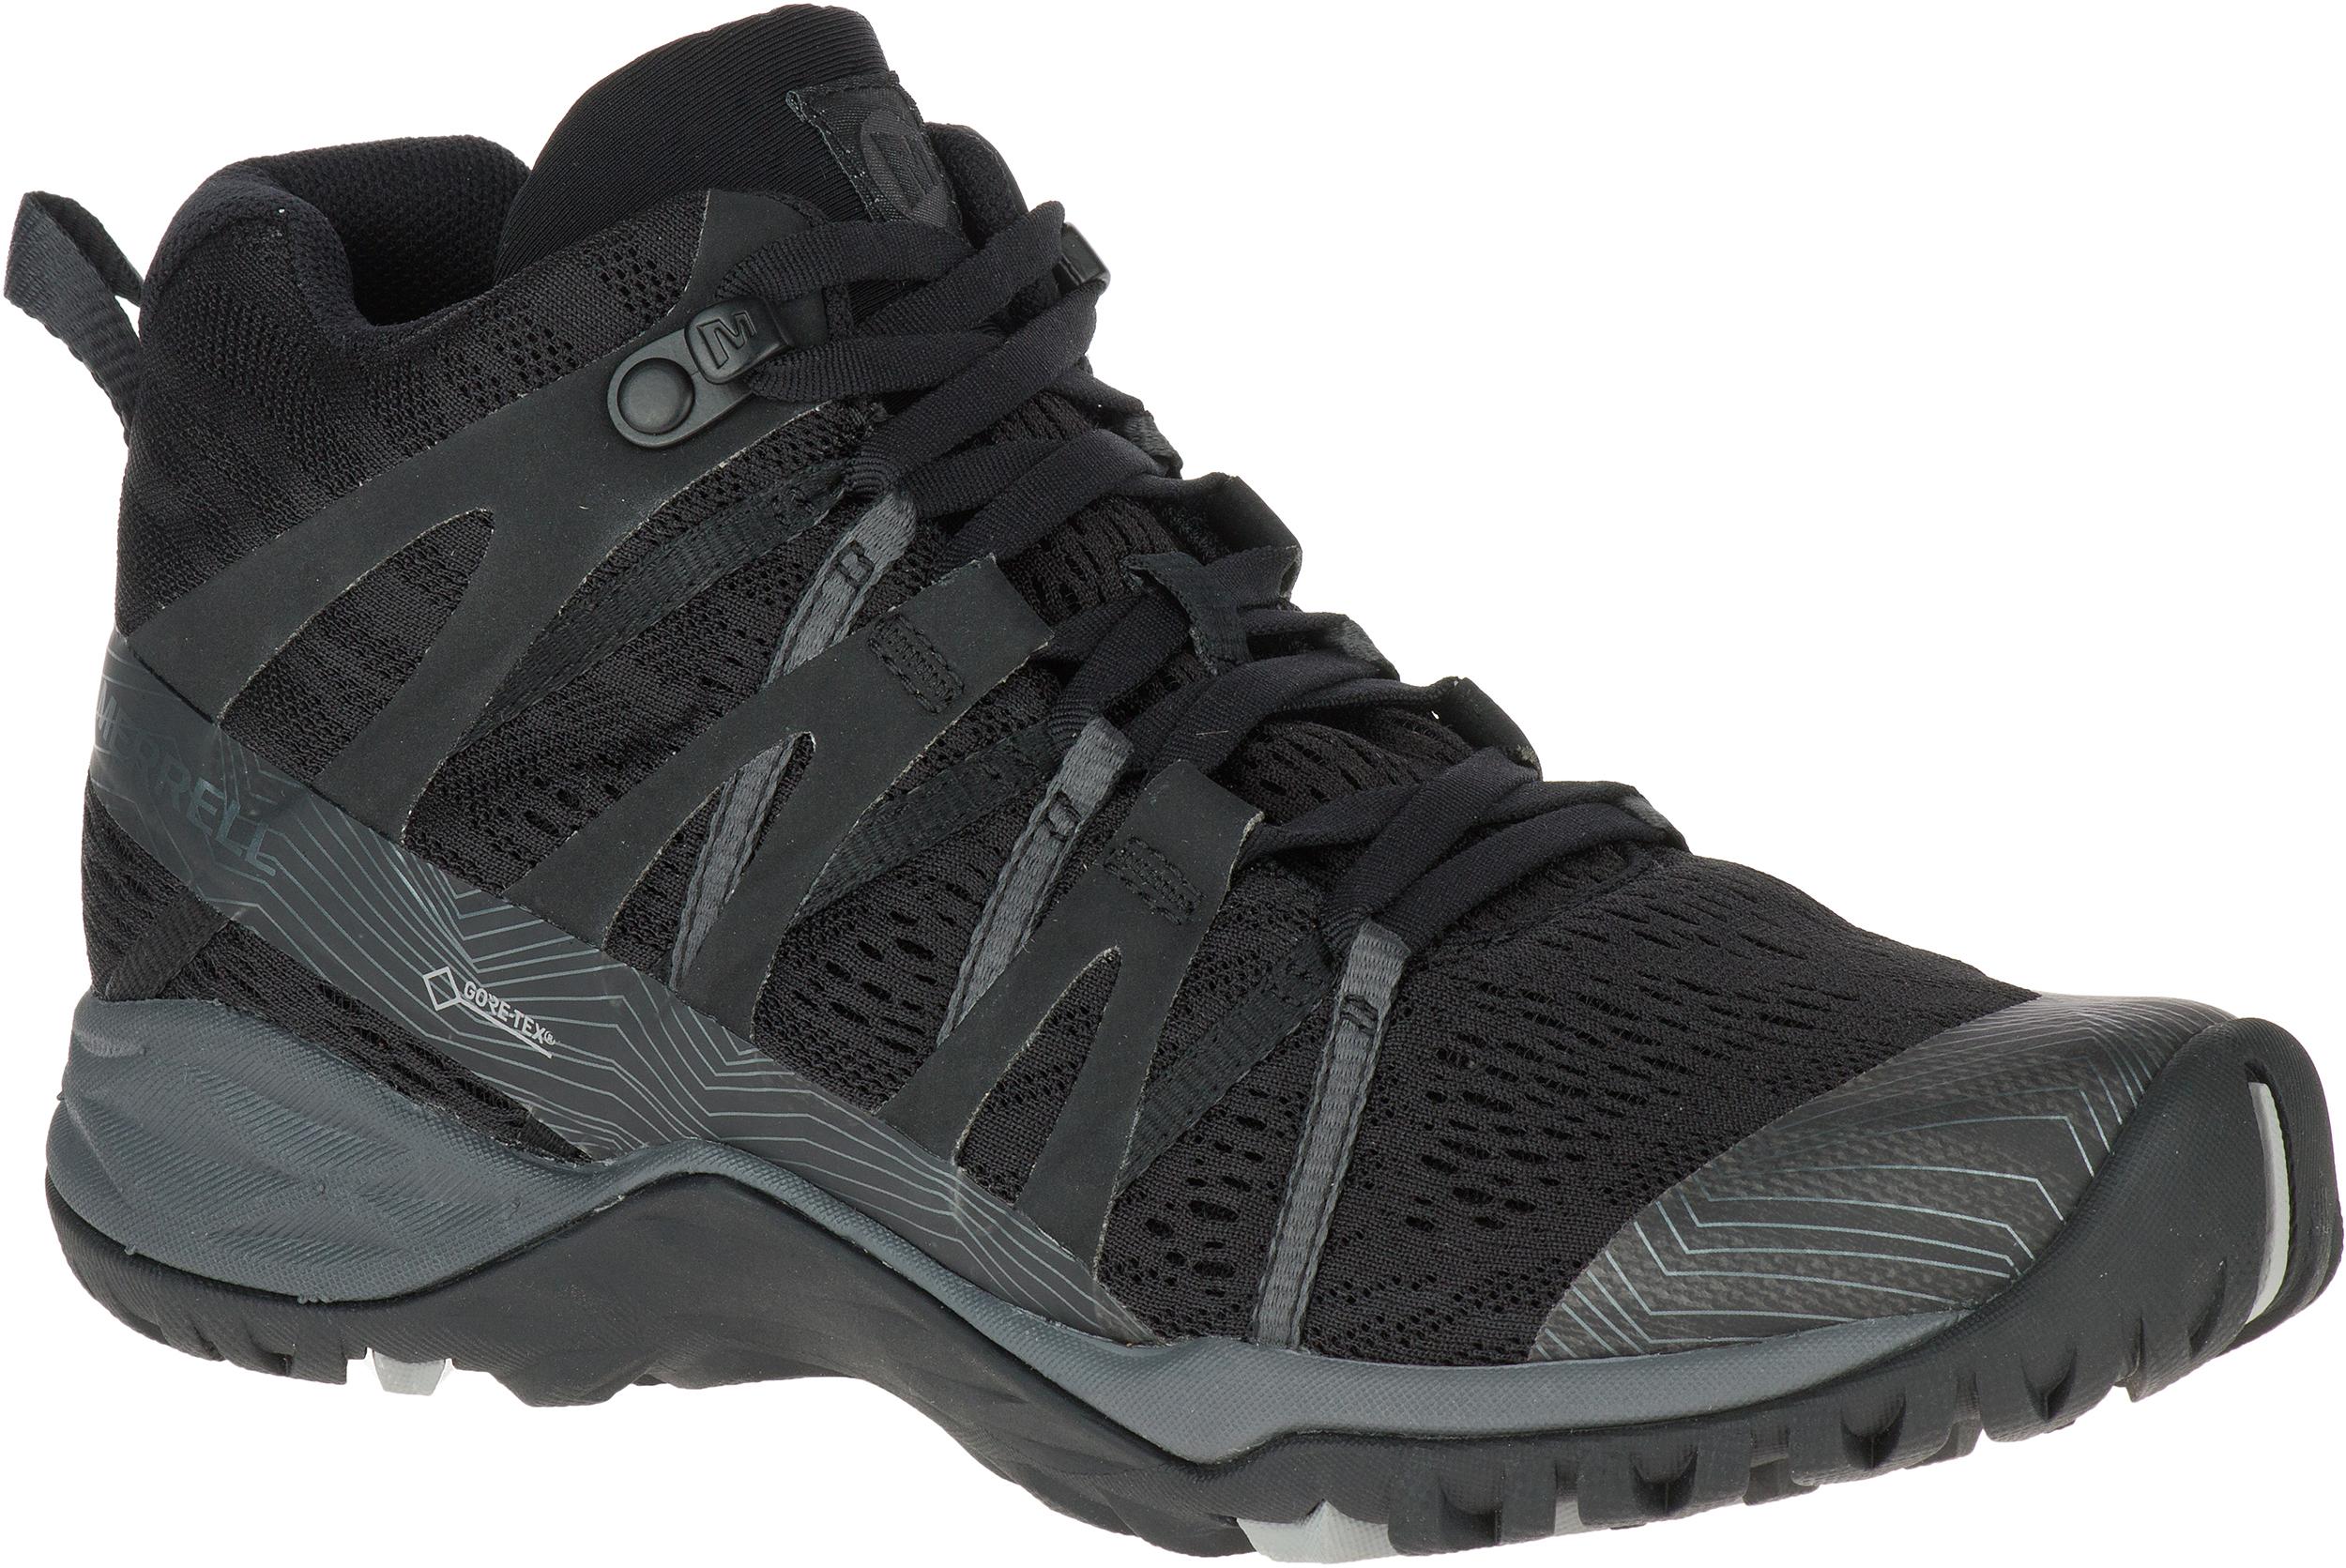 3063e99ef94 Merrell Footwear | MEC